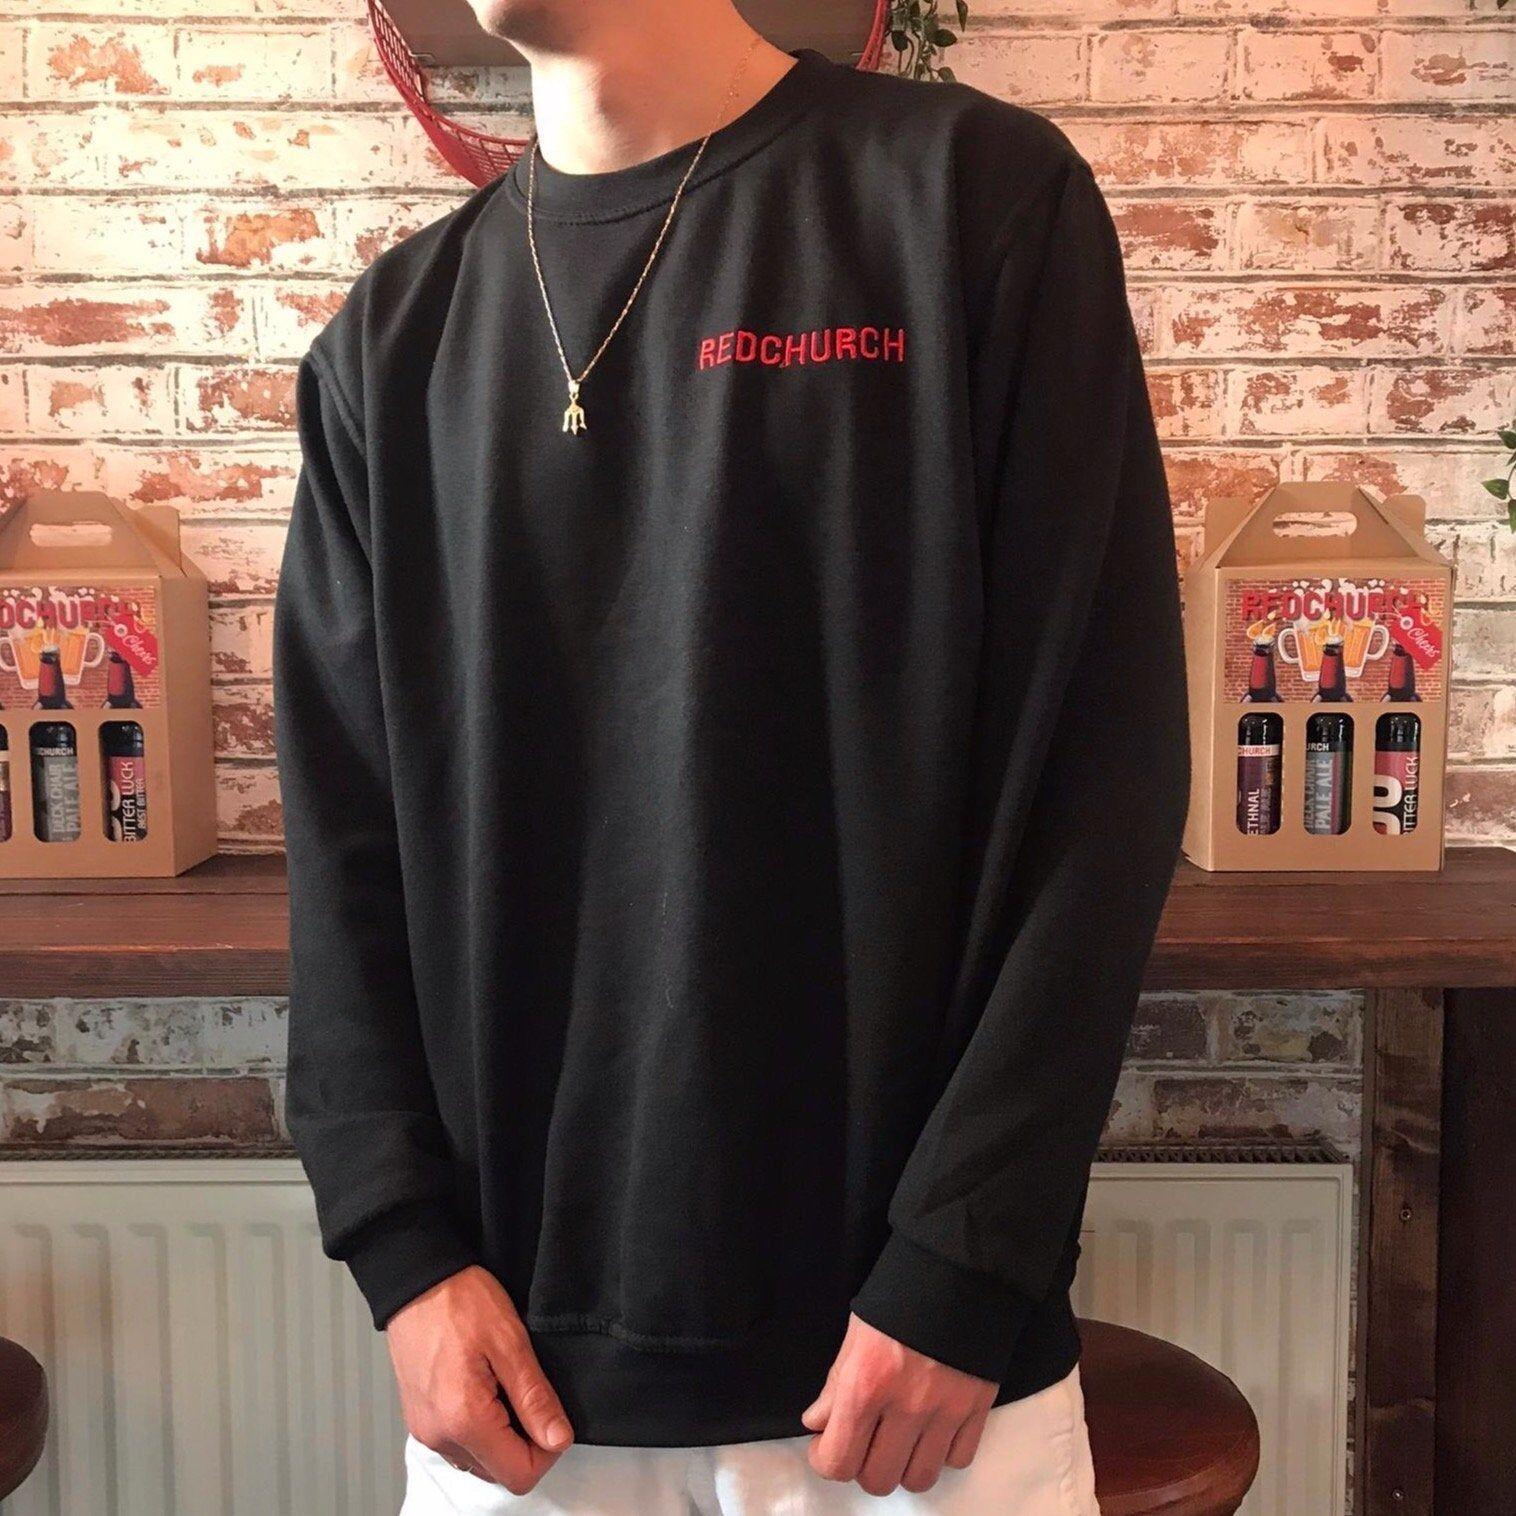 Redchurch Brewery Redchurch Embroidered Sweat Shirt - Medium  40-42